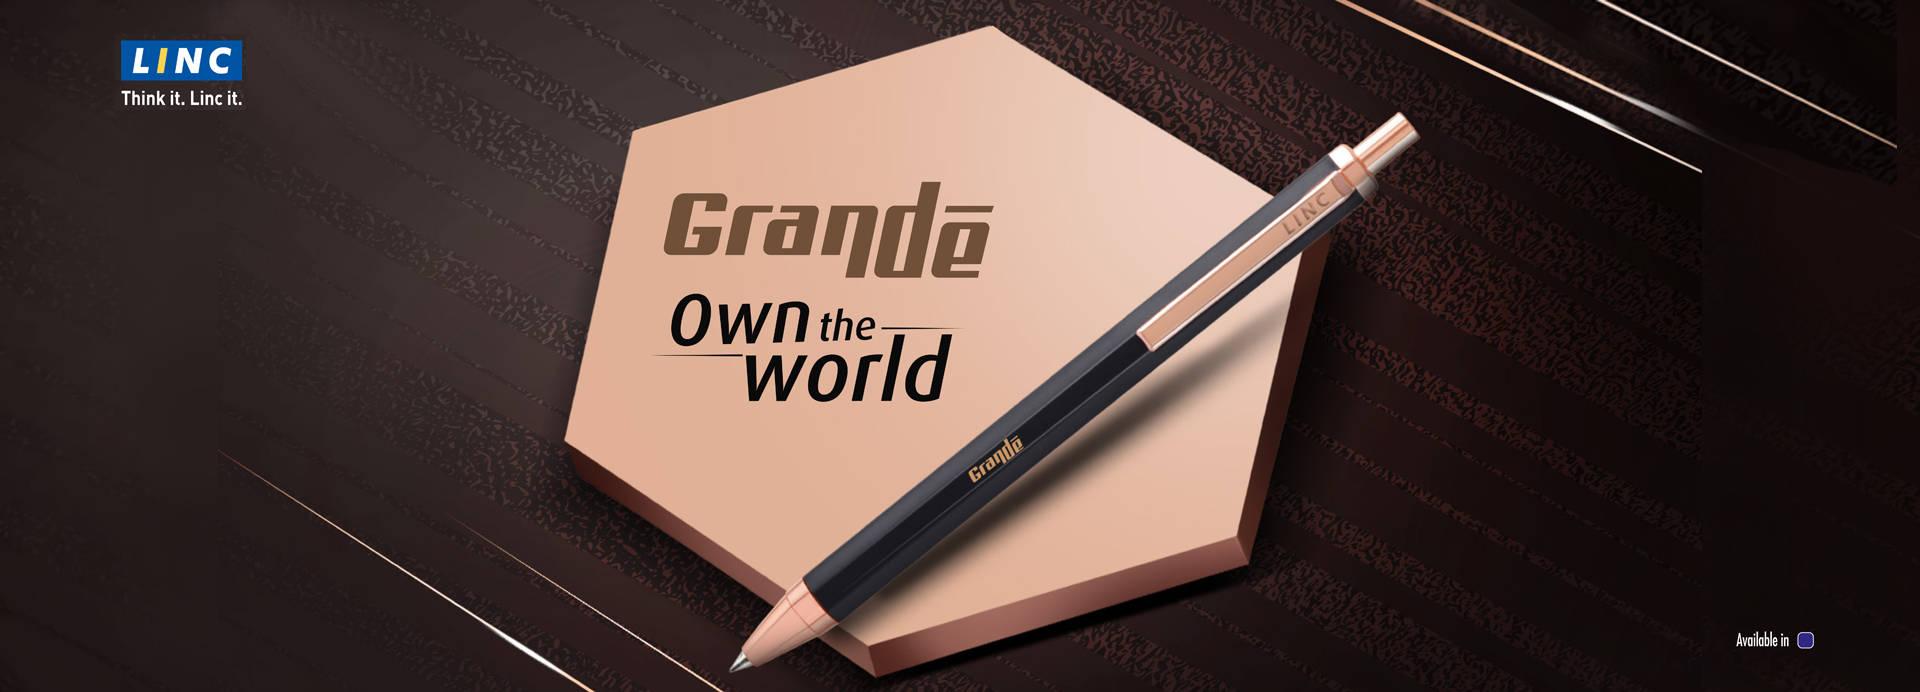 smooth writing pens